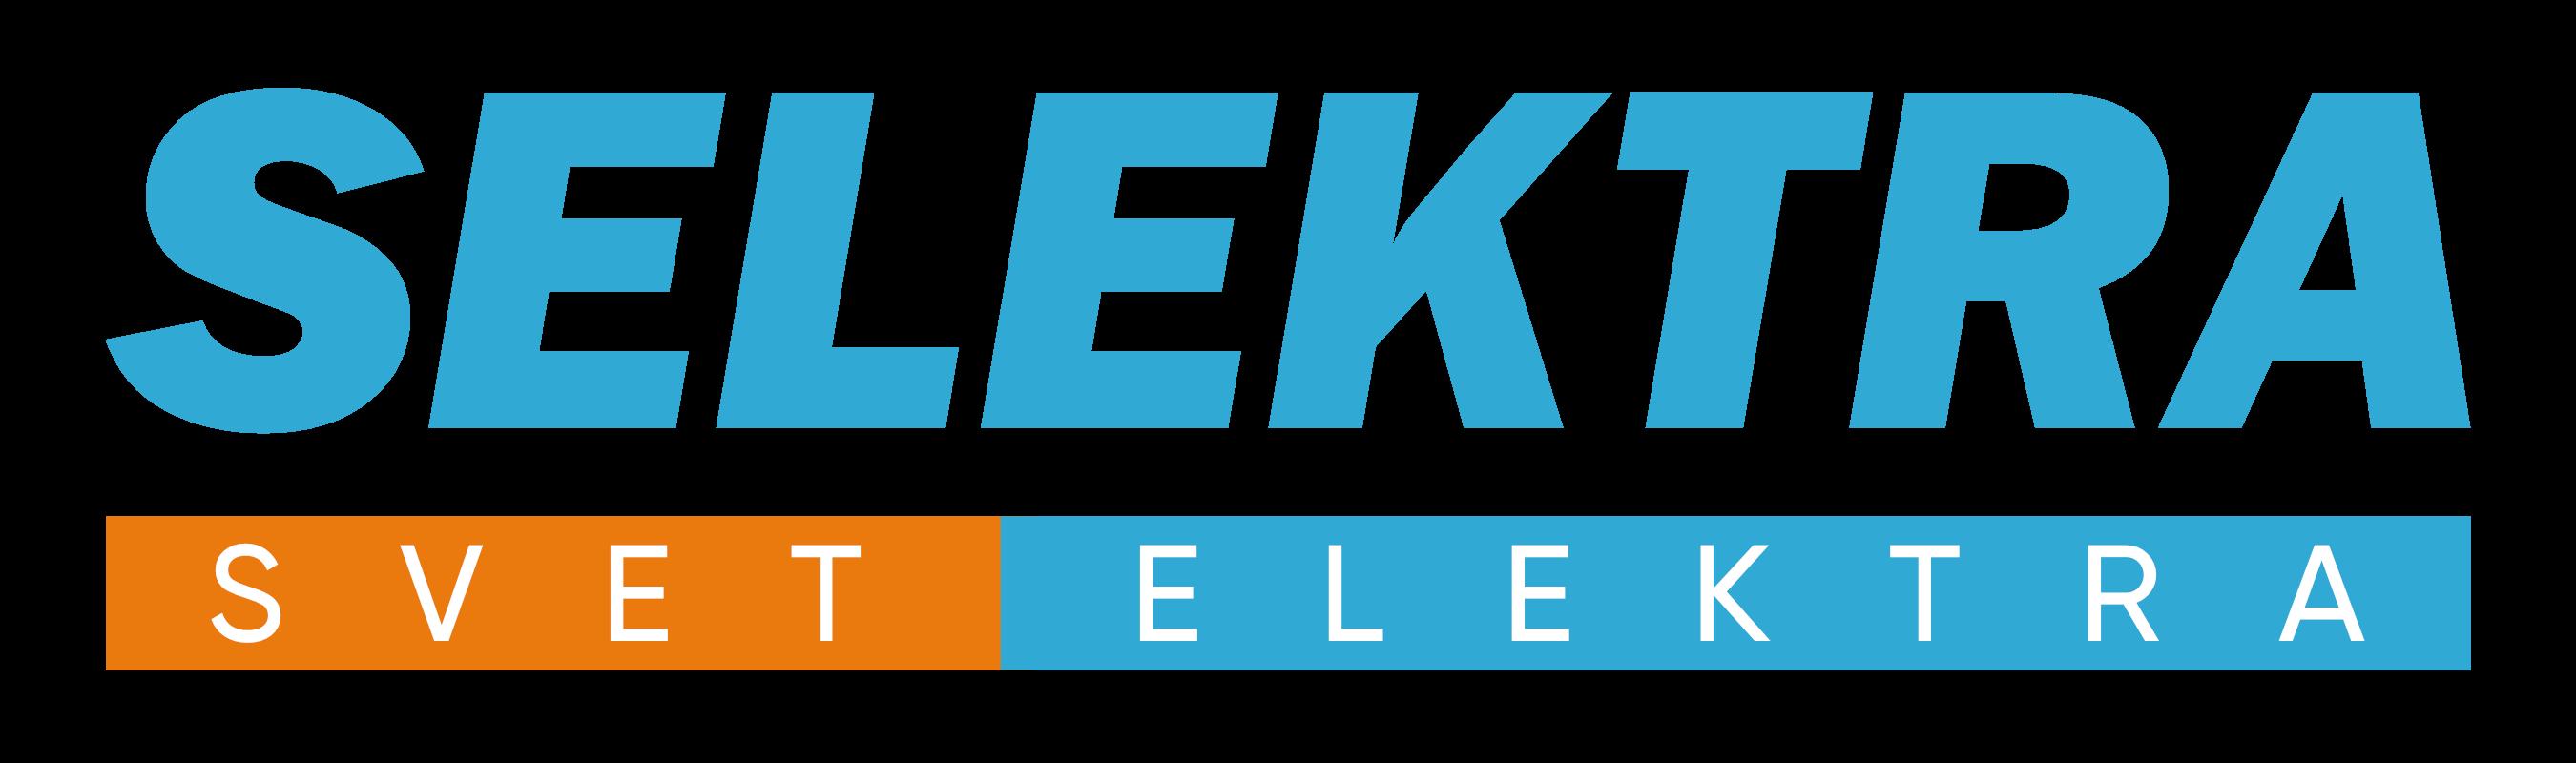 selektra_logo